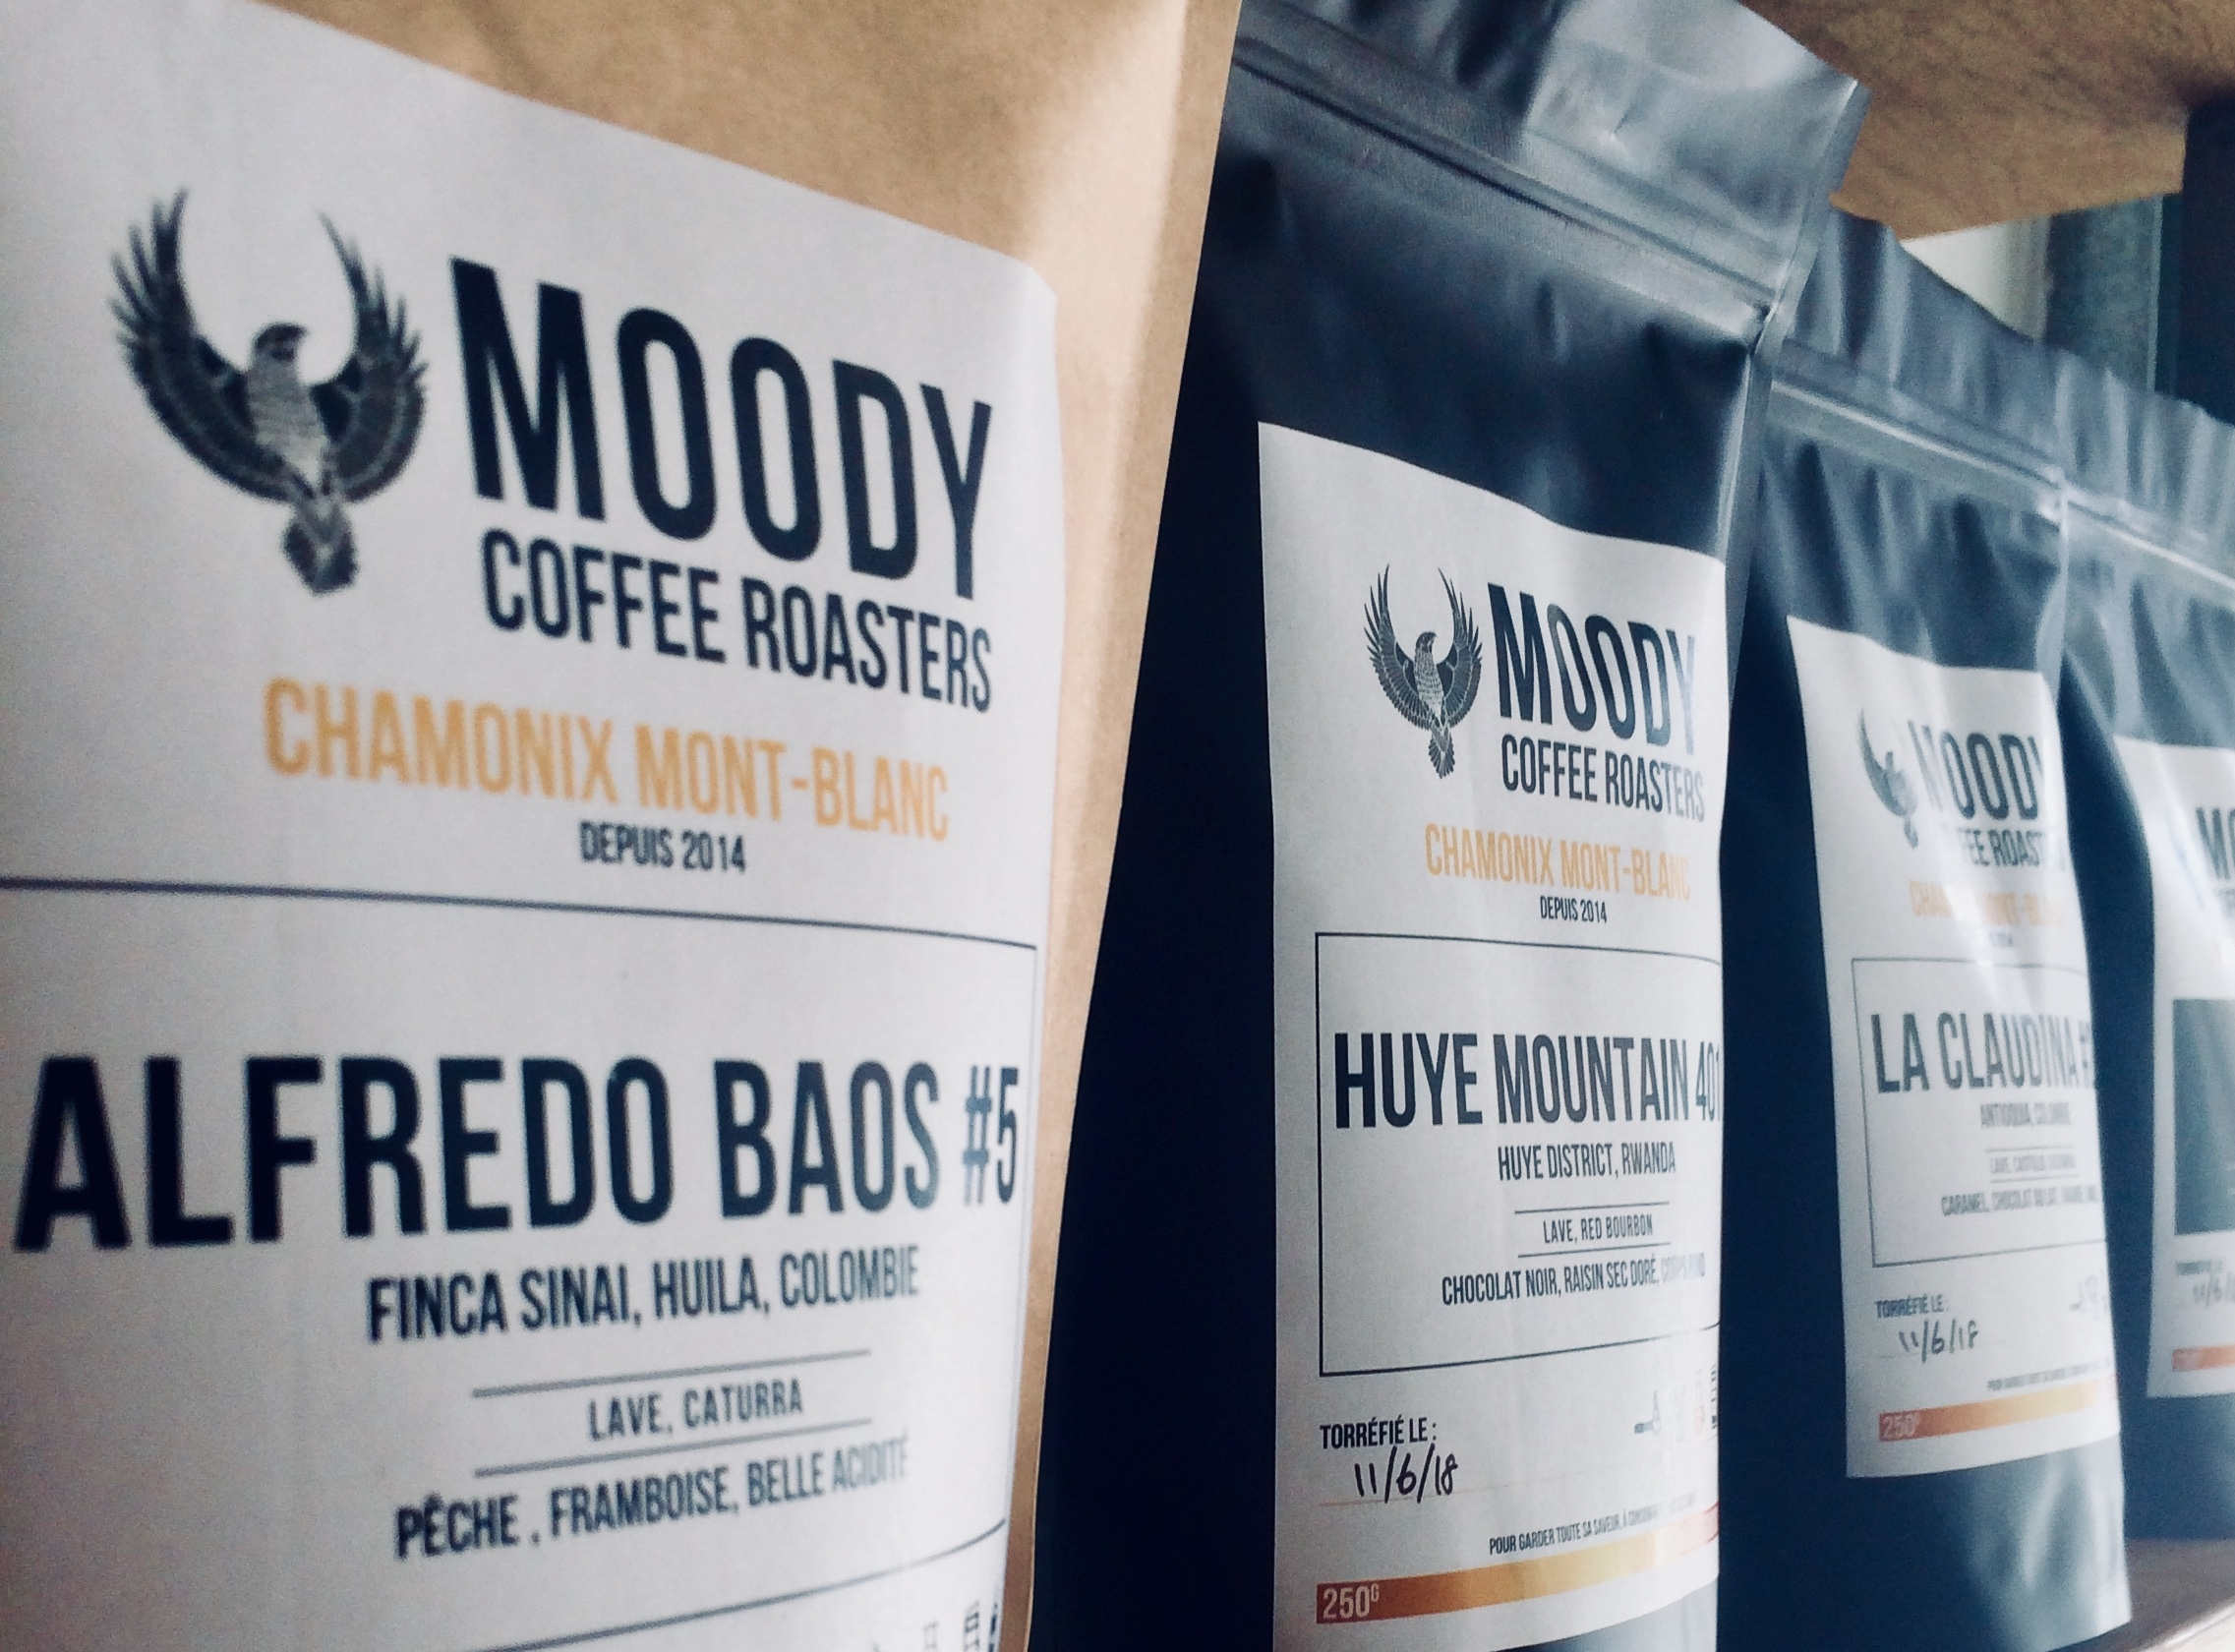 FRESHLY ROASTED COFFEE IN CHAMONIX MONT-BLANC